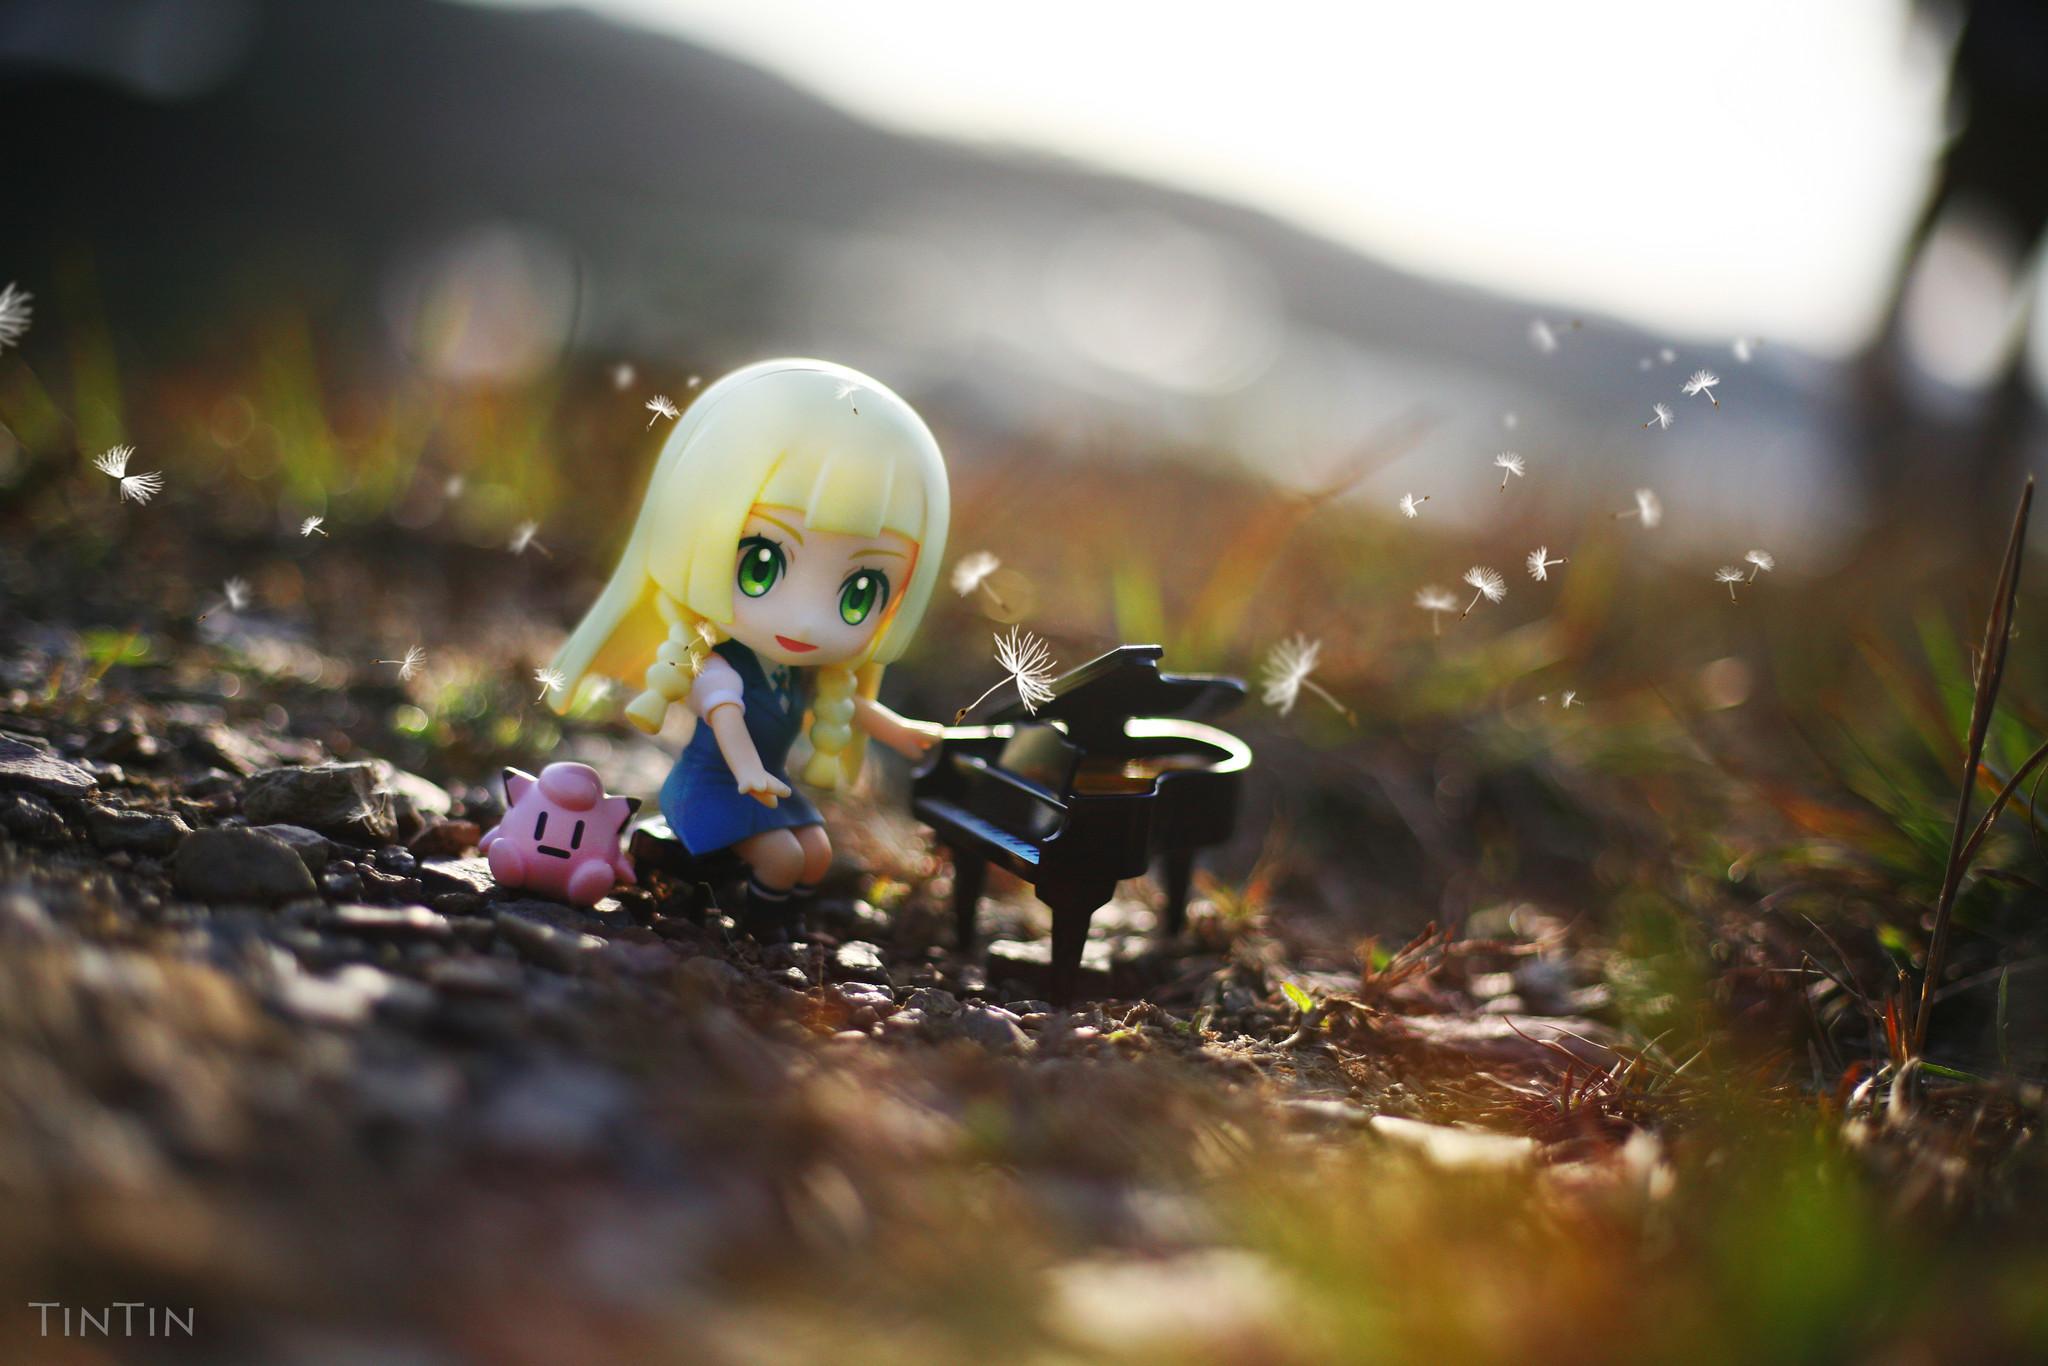 nintendo nendoroid good_smile_company nendoron game_freak shichibee creatures_inc. lilie pocket_monsters_sun pocket_monsters_moon cosmog